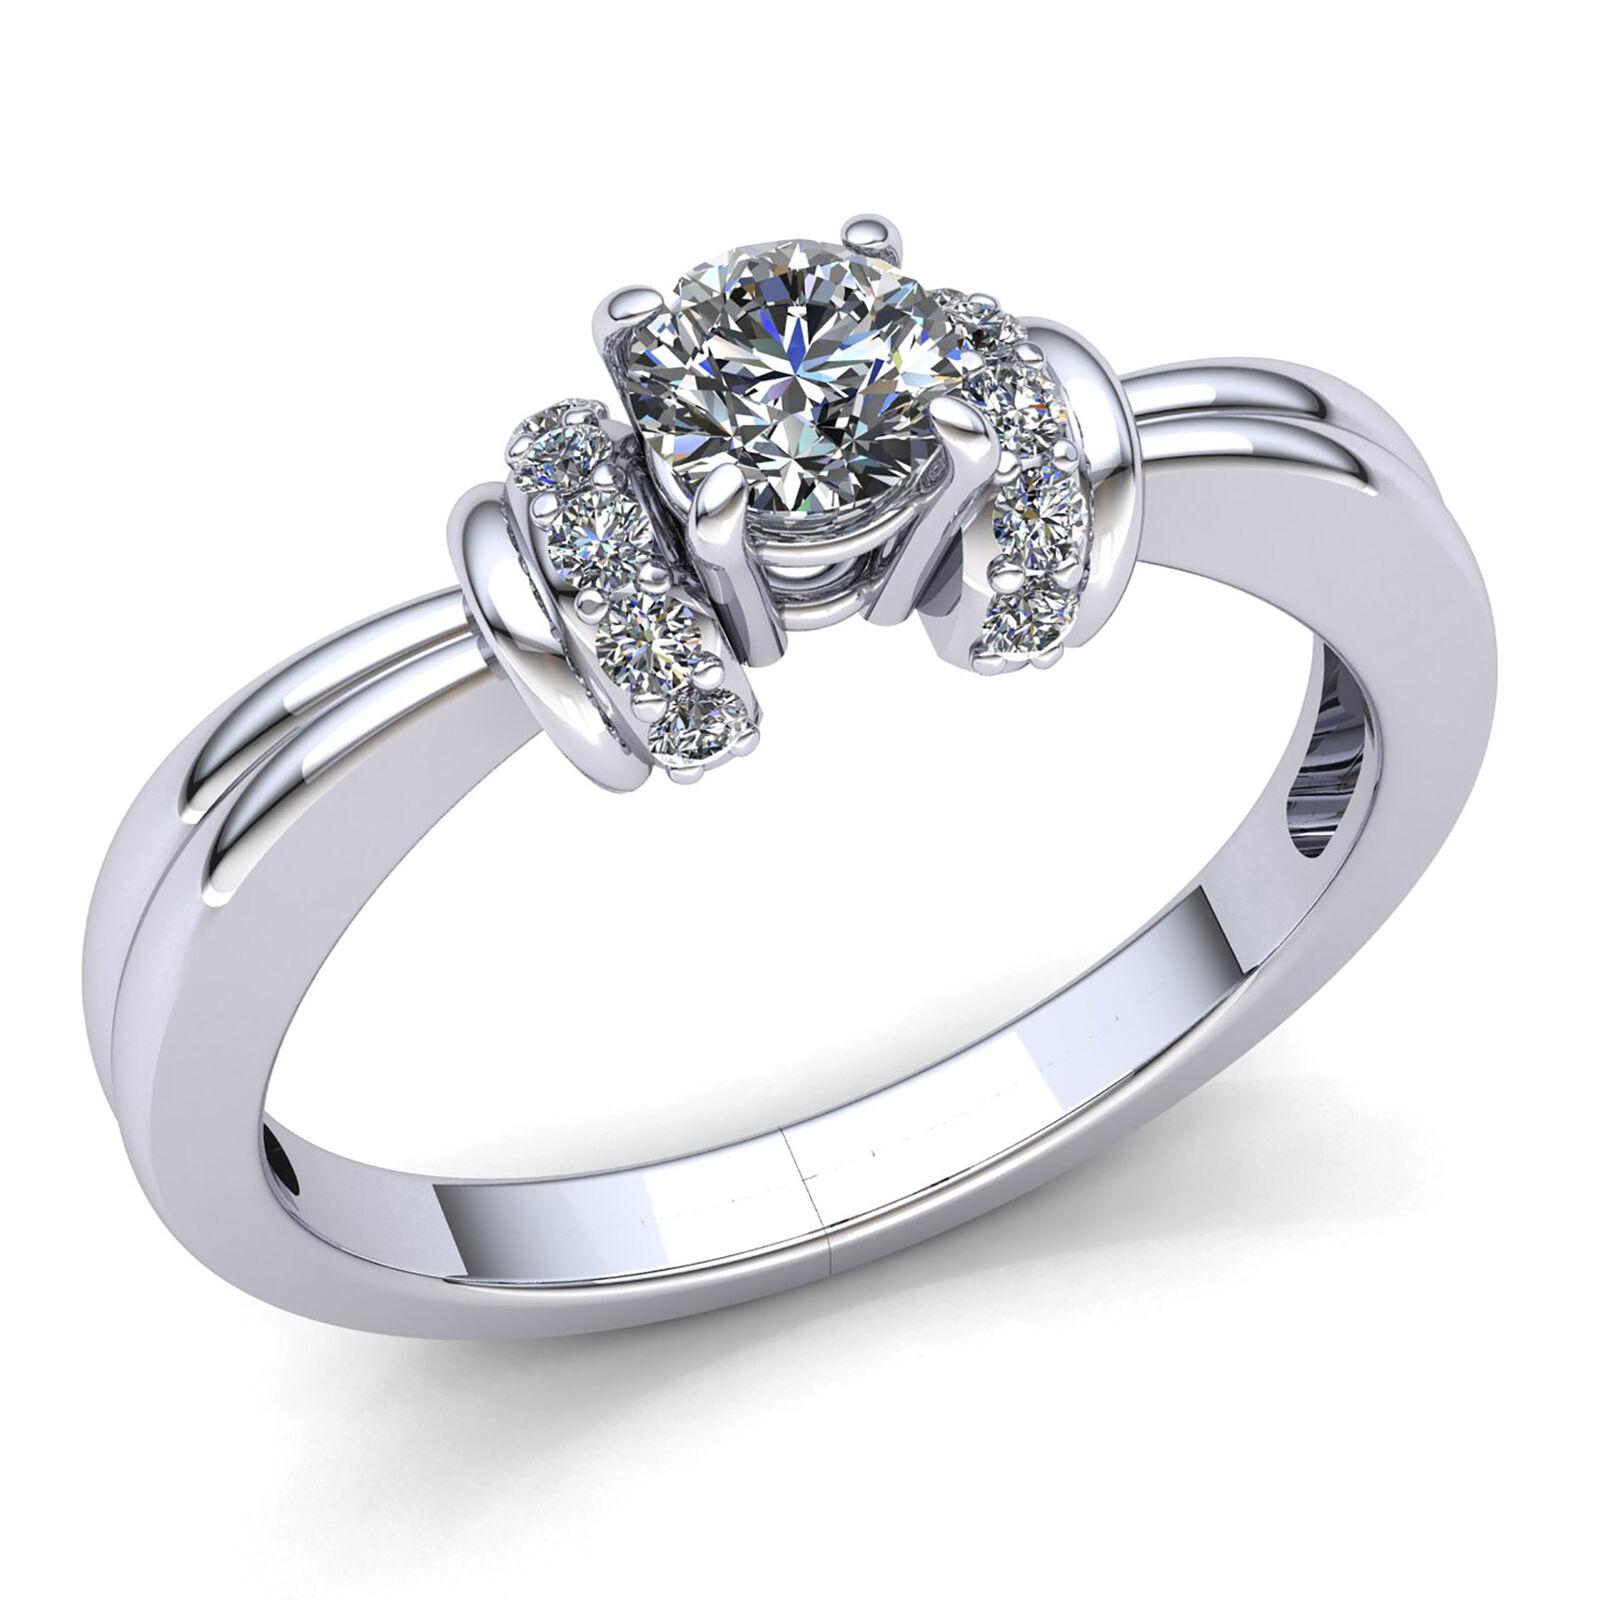 Genuine 0.5ct Round Cut Diamond Ladies Fancy Solitaire Engagement Ring 10K gold